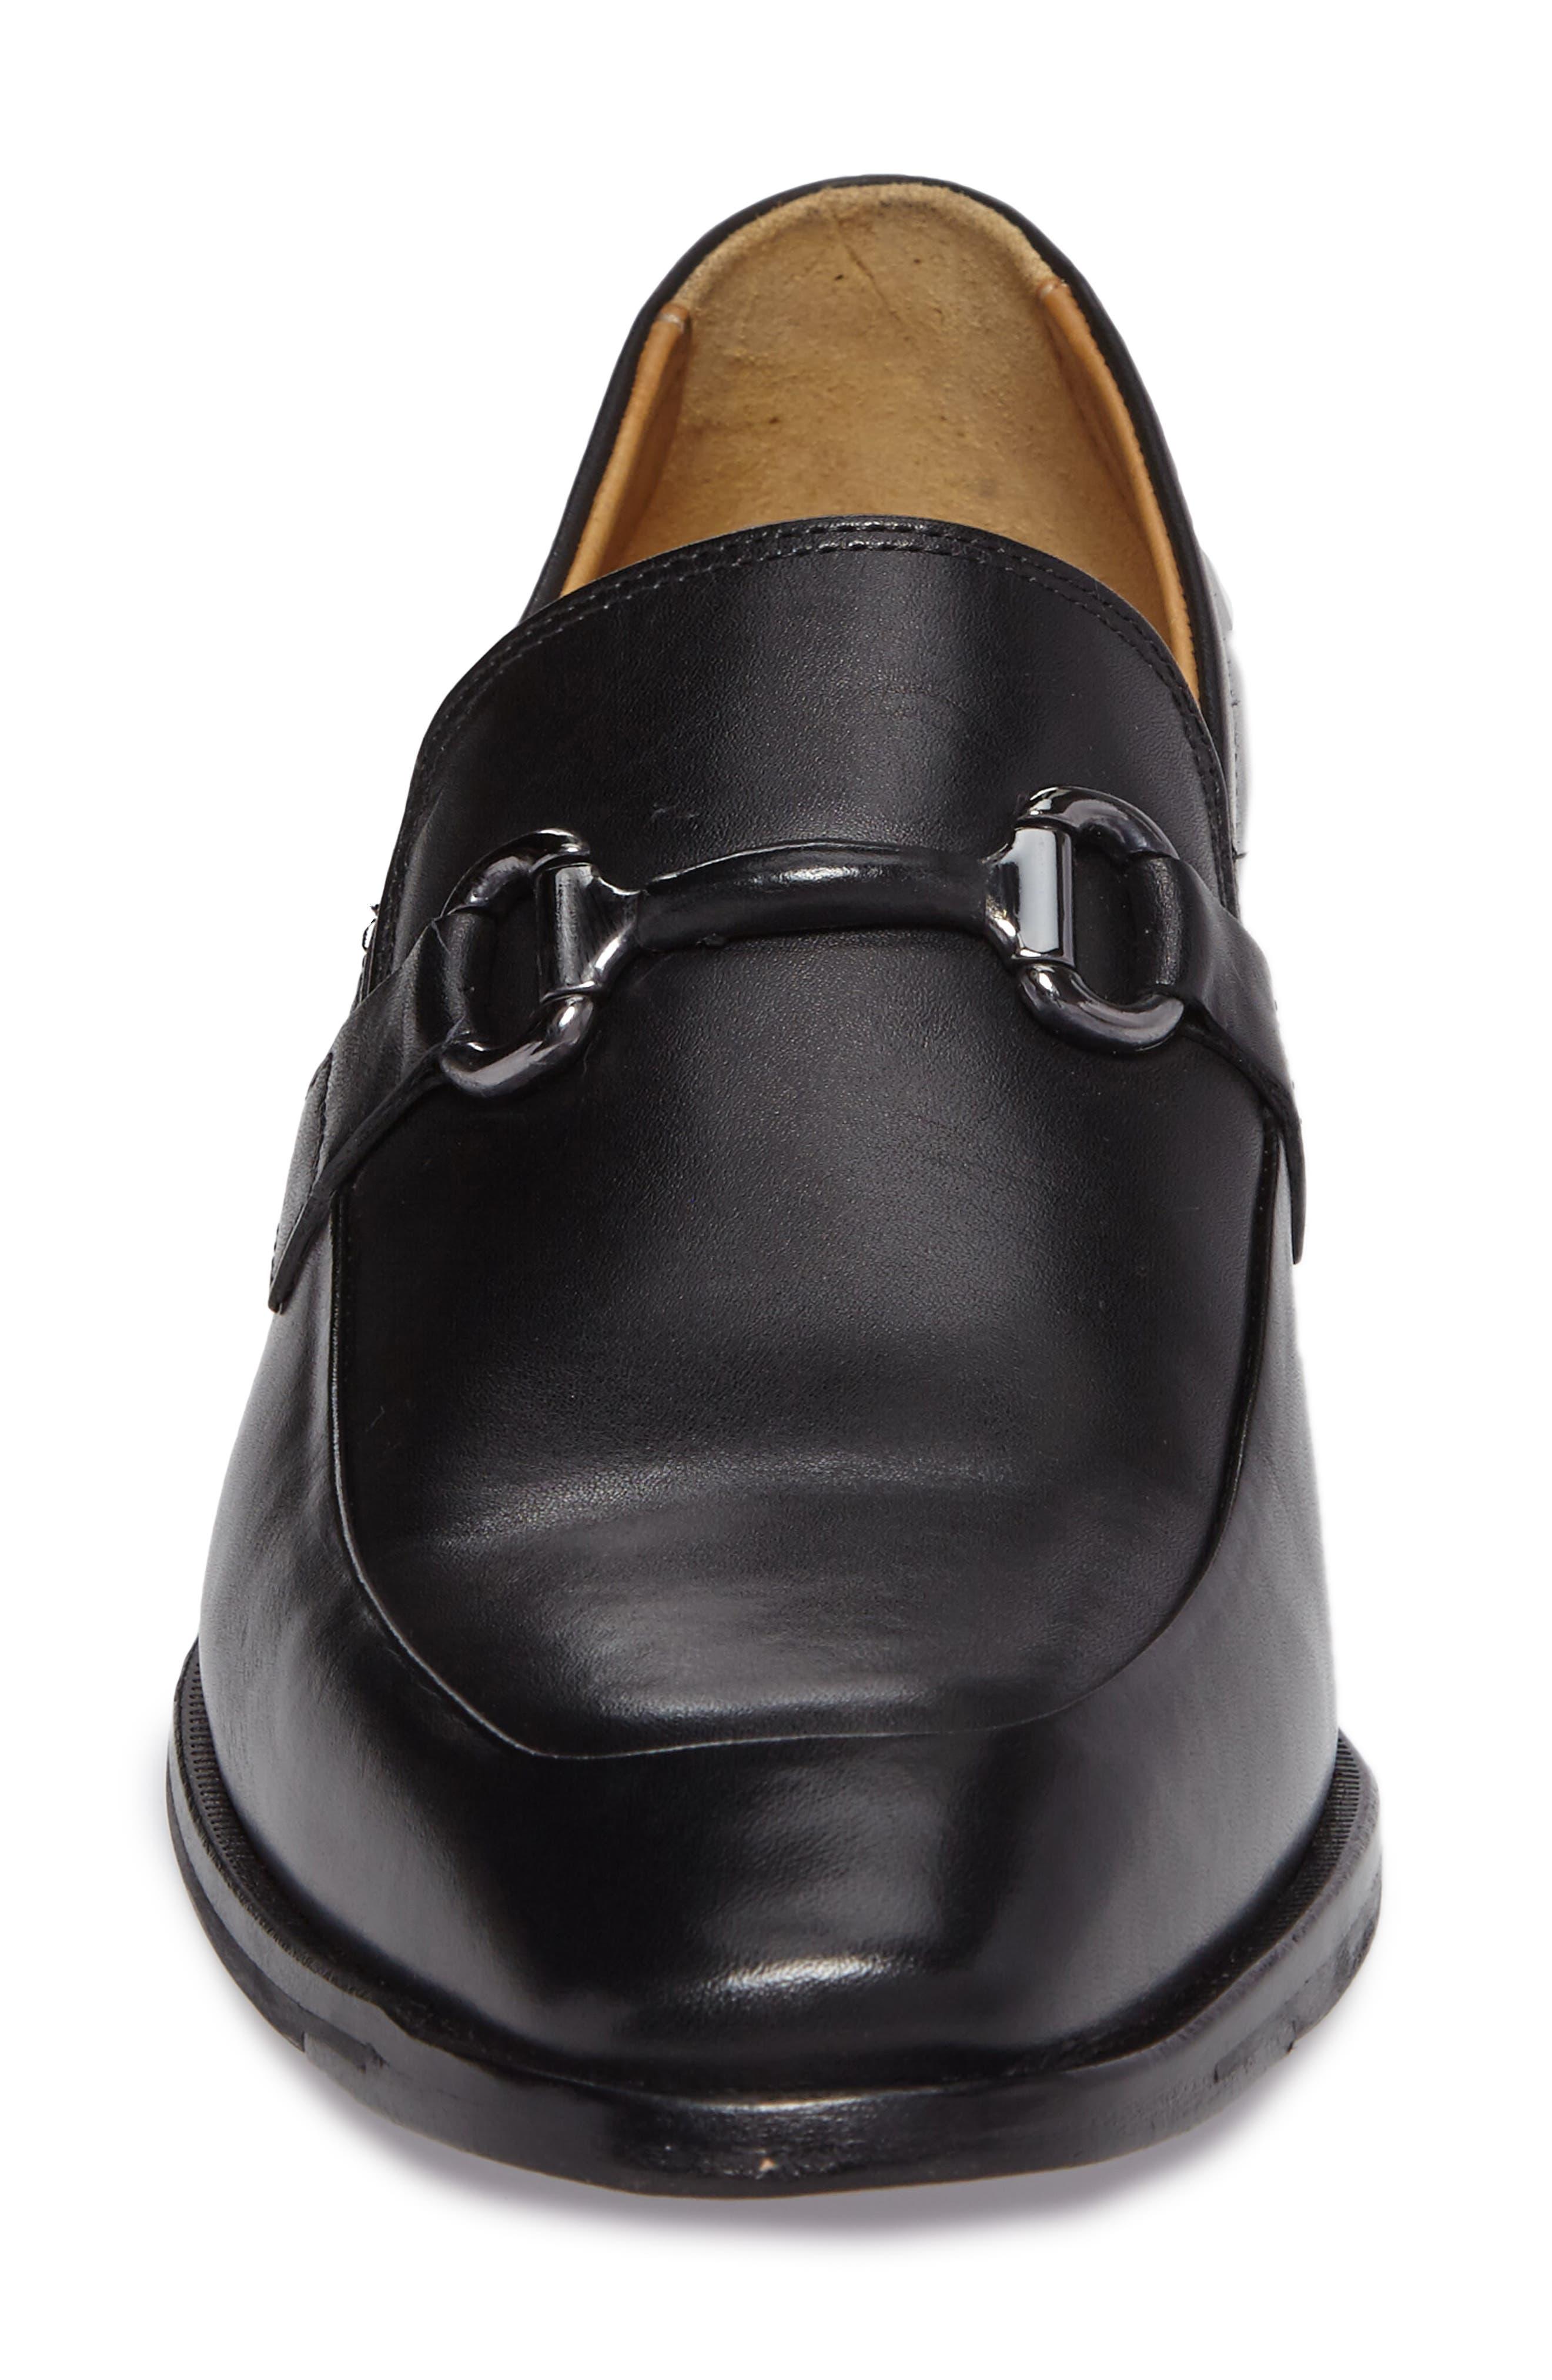 McClain Bit Loafer,                             Alternate thumbnail 4, color,                             Black